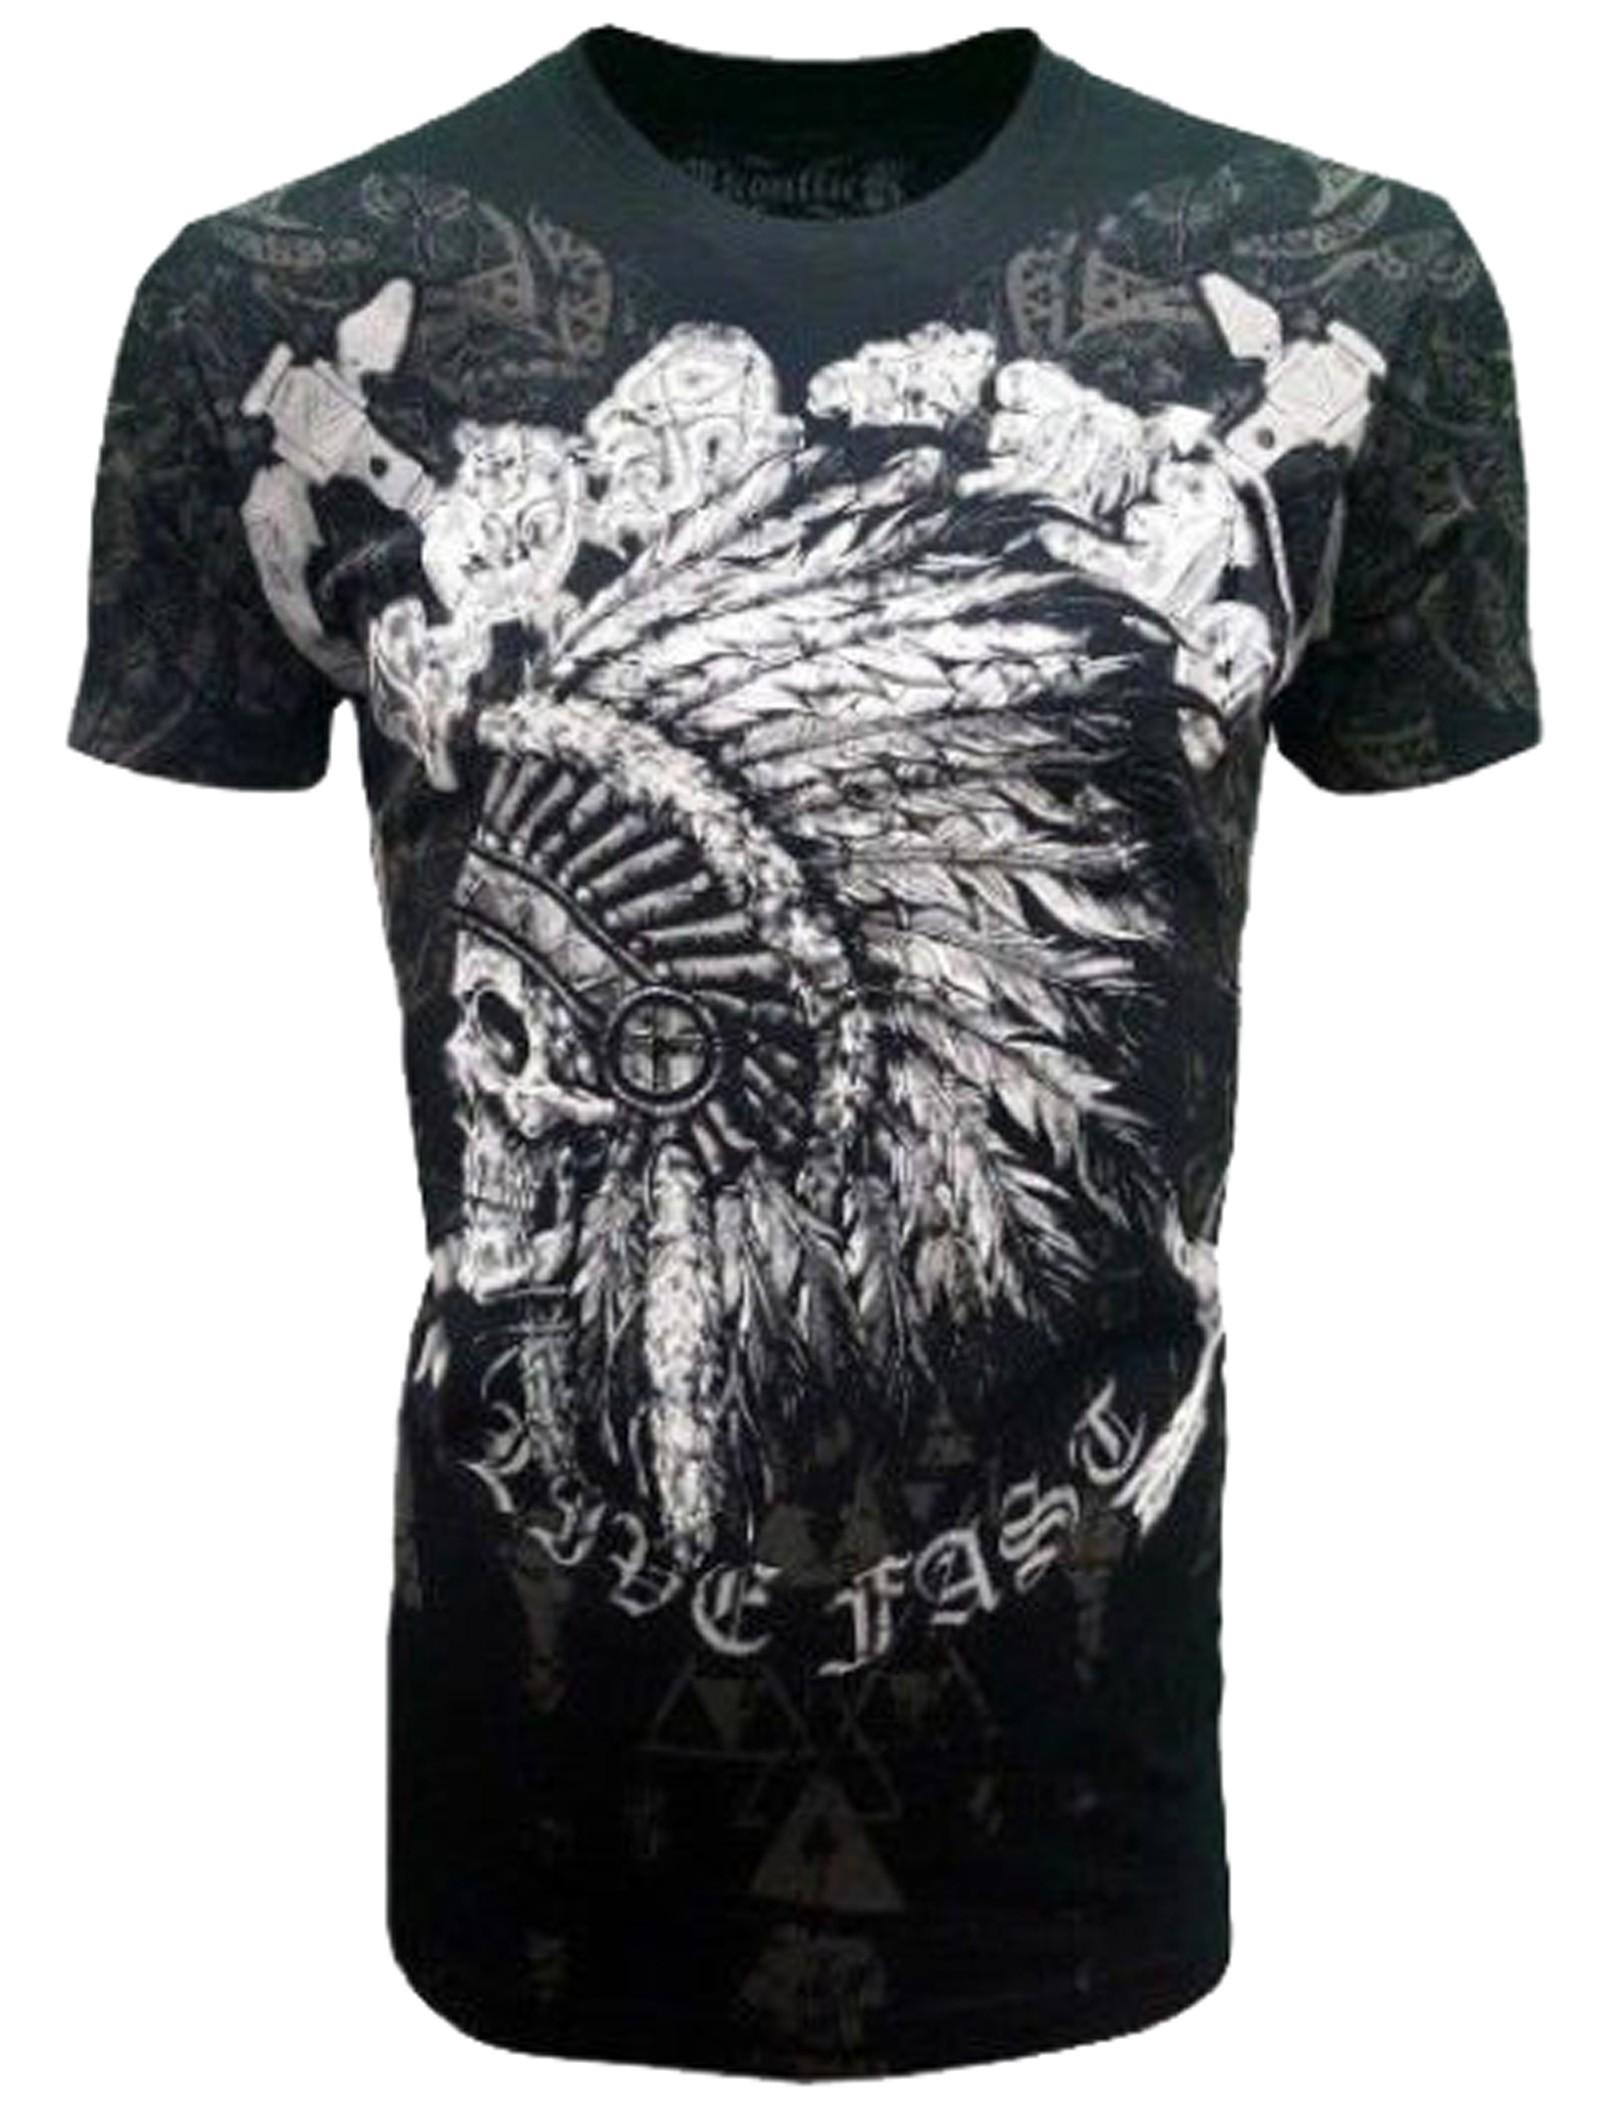 Konflic Clothing - Chief Skull T-Shirt